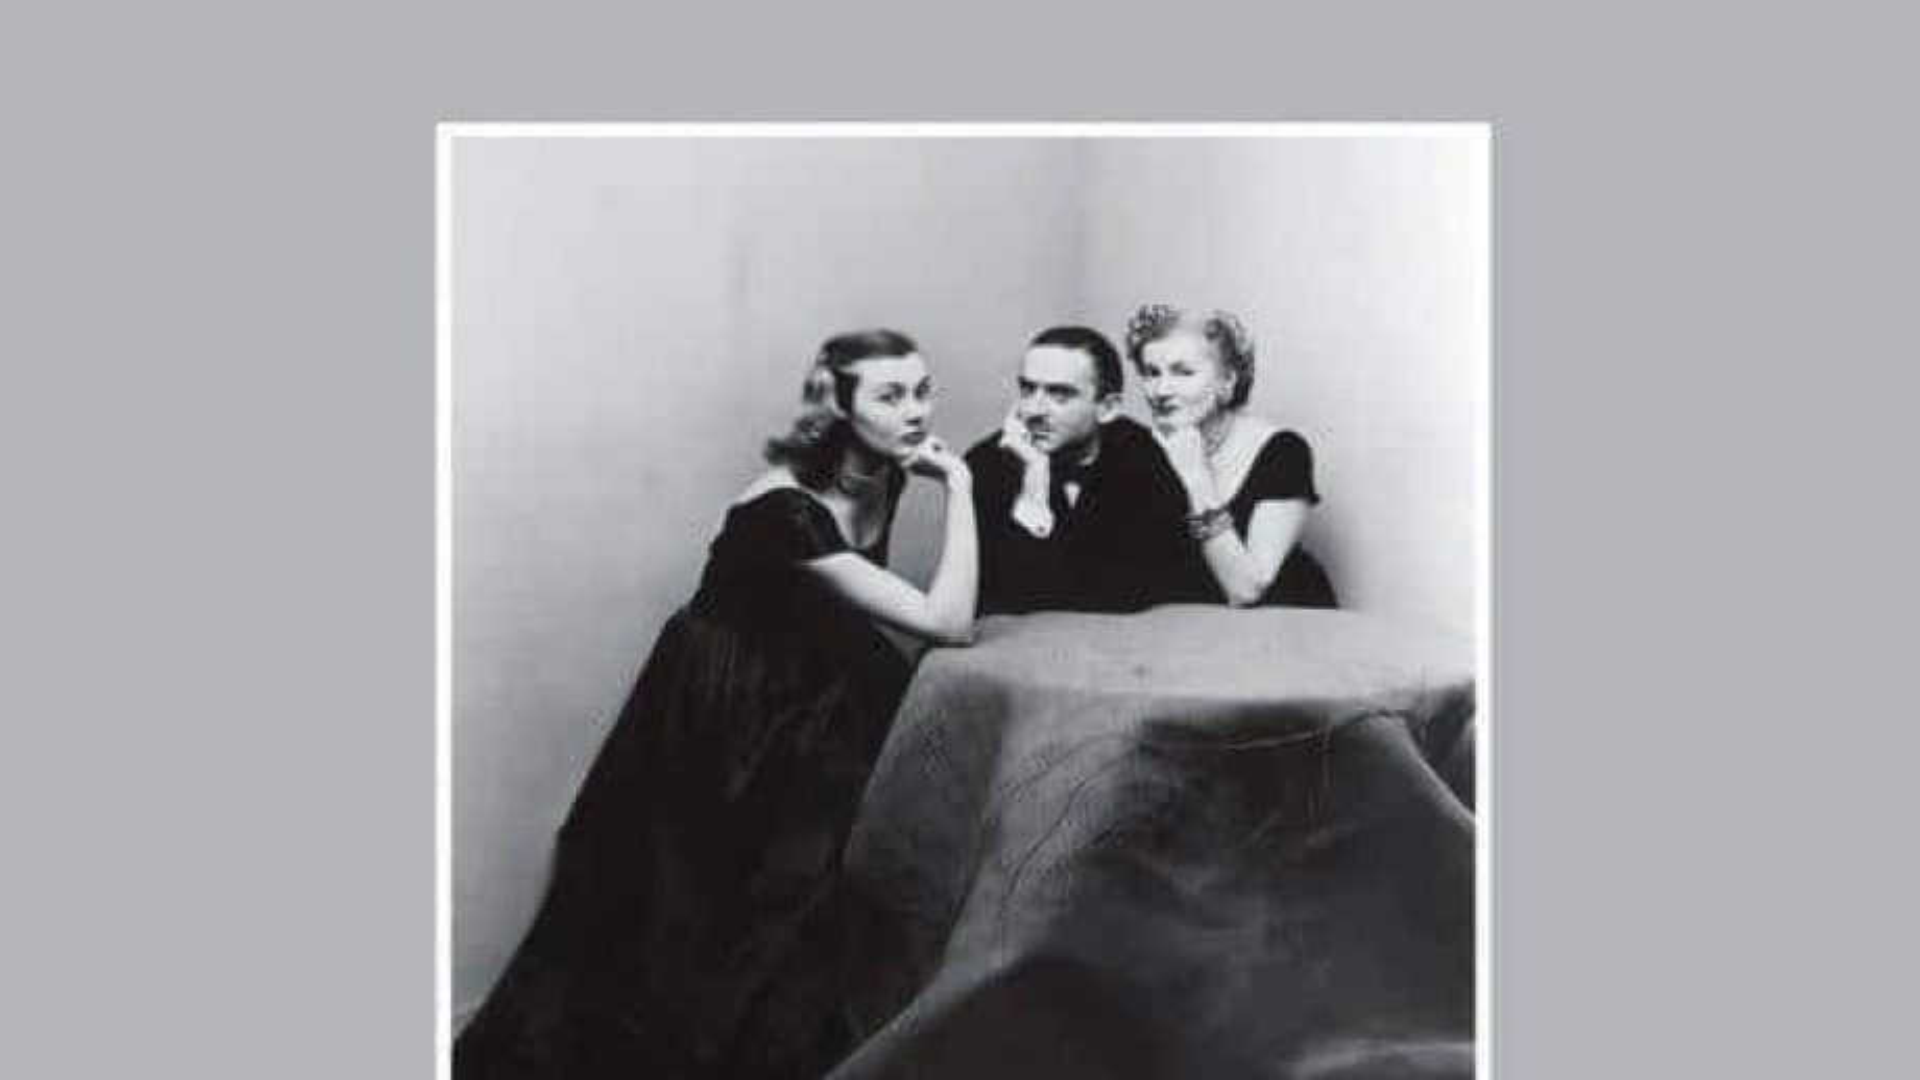 Francine du Plessix Gray (1933–2019)